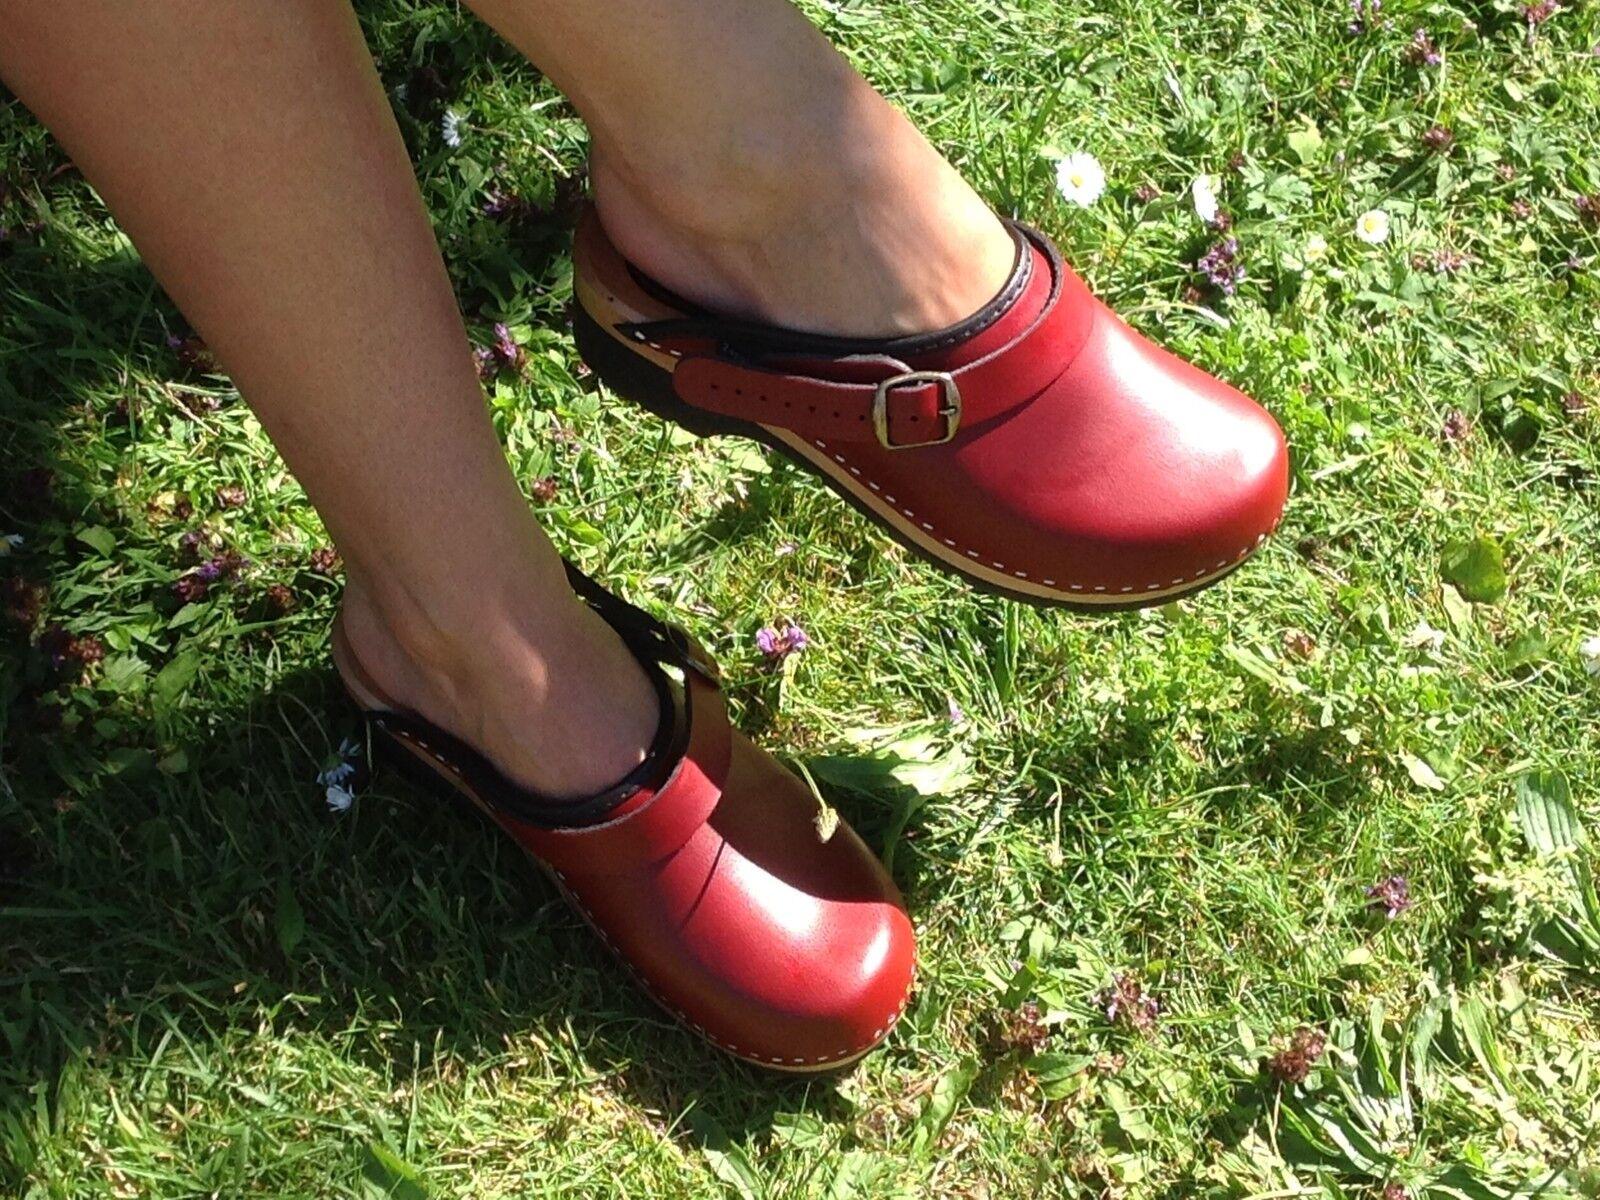 Lady Schuhe Clogs Stillen Krankenhaus Garten Weiß Maultier Ohne Bügel